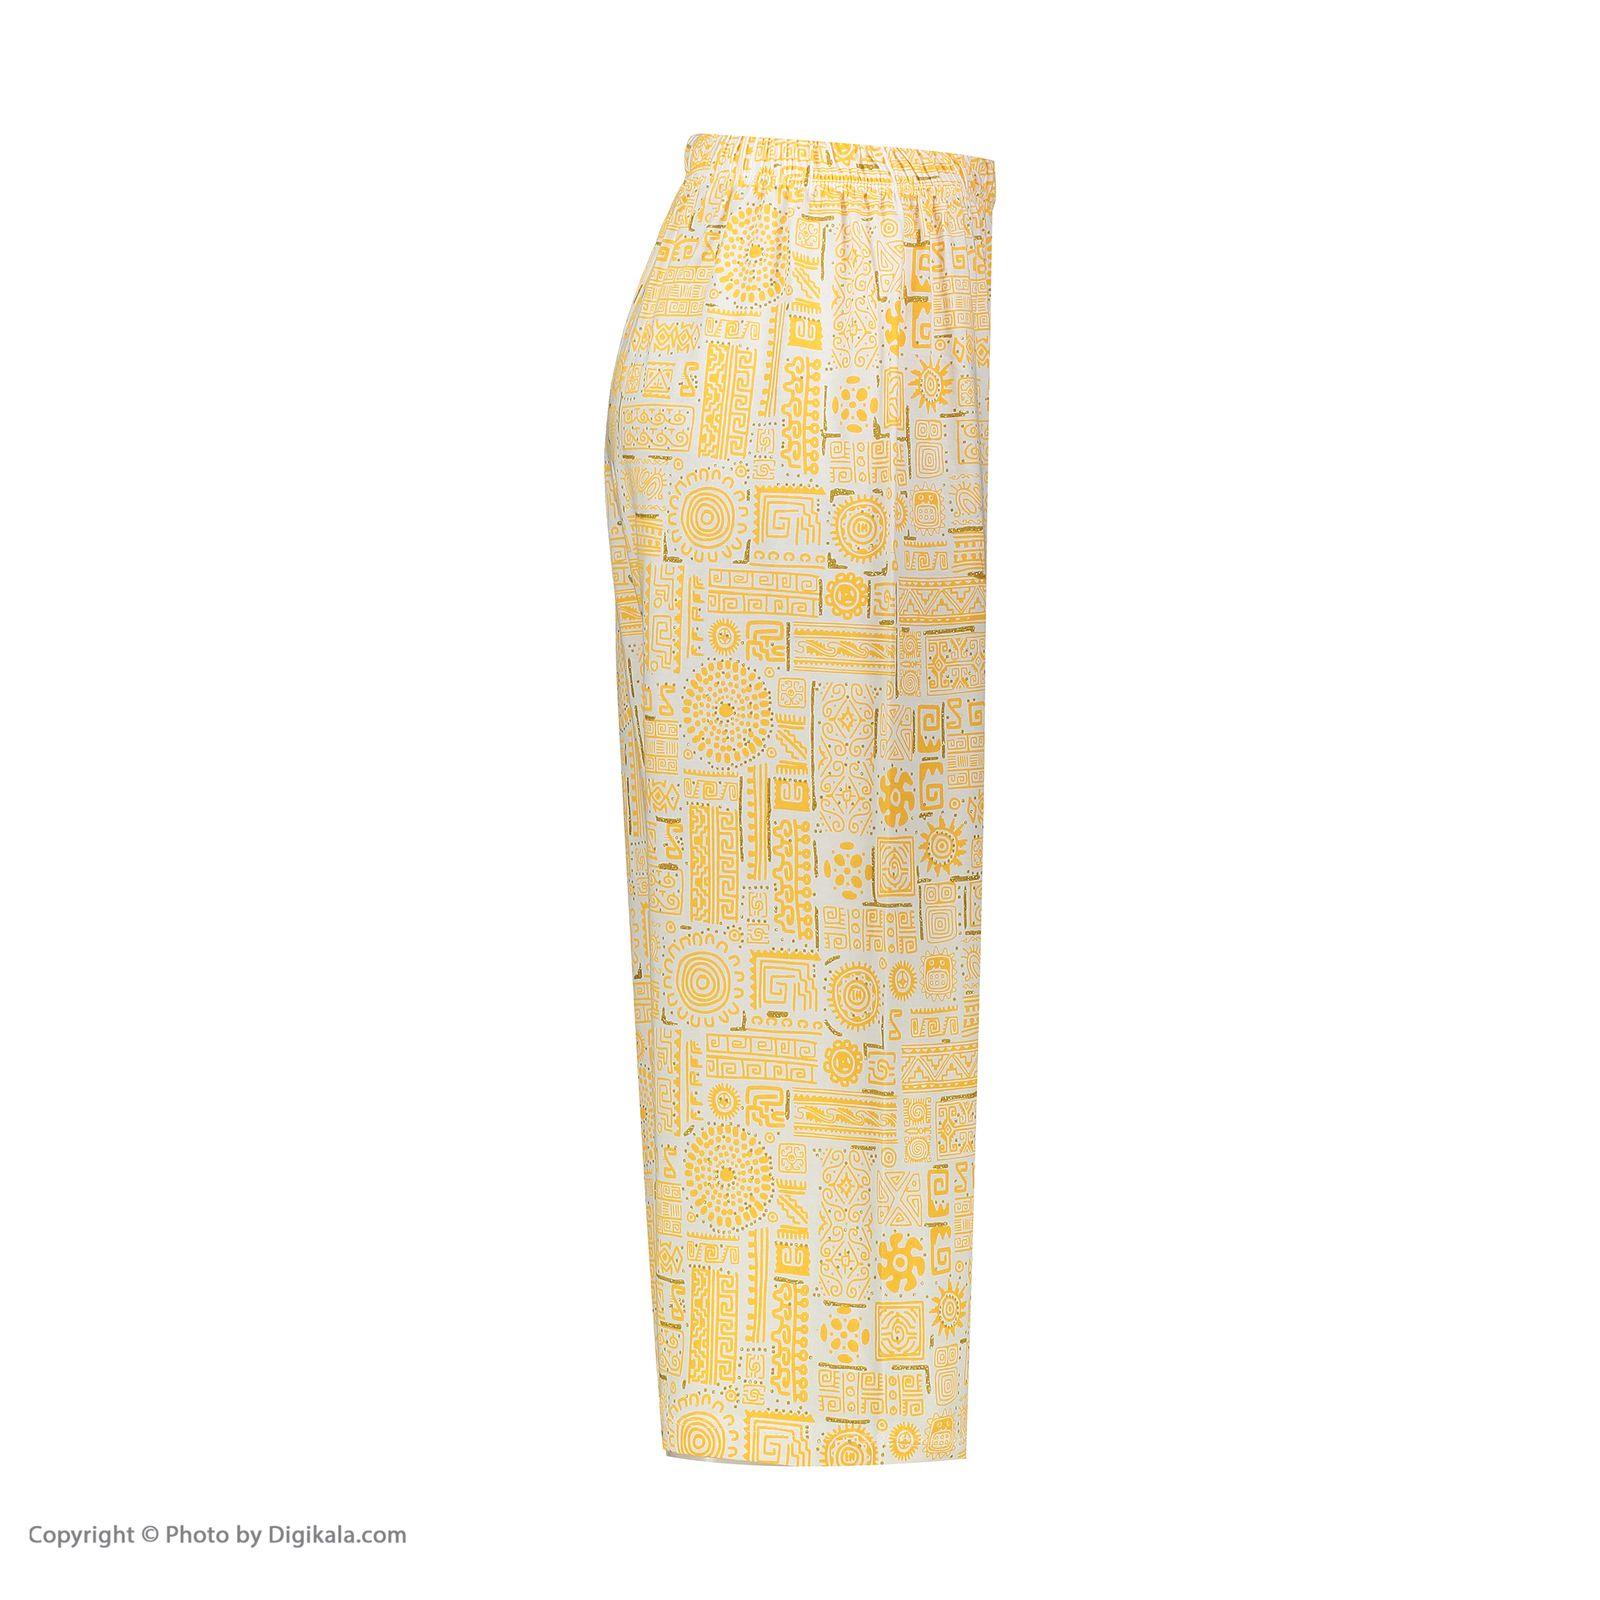 ست تاپ و شلوارک زنانه کد 0217 رنگ زرد -  - 5